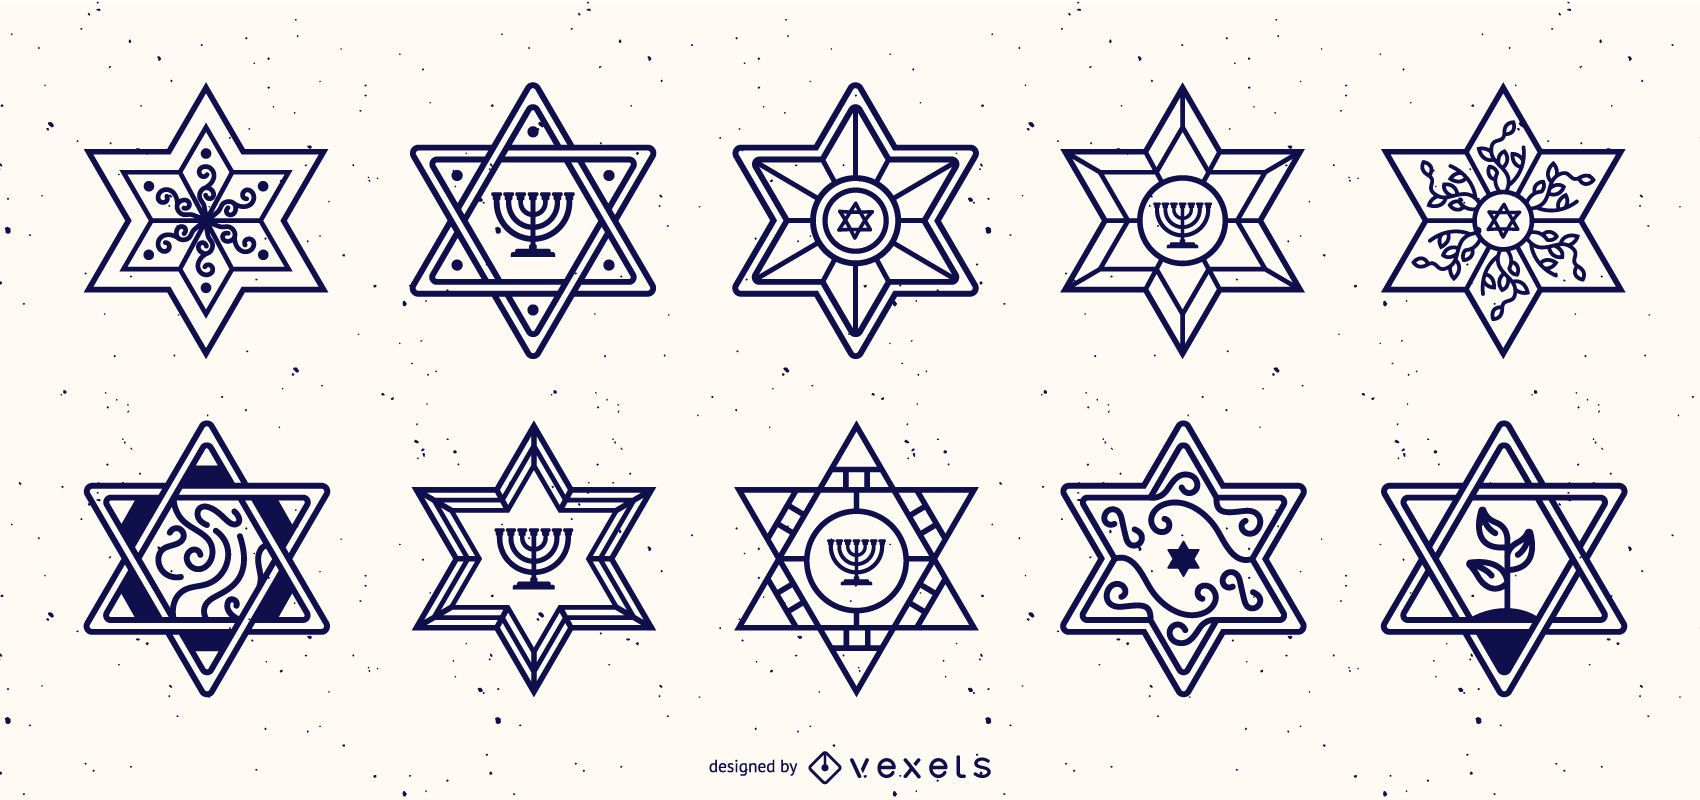 Star of David Stroke Design Kollektion